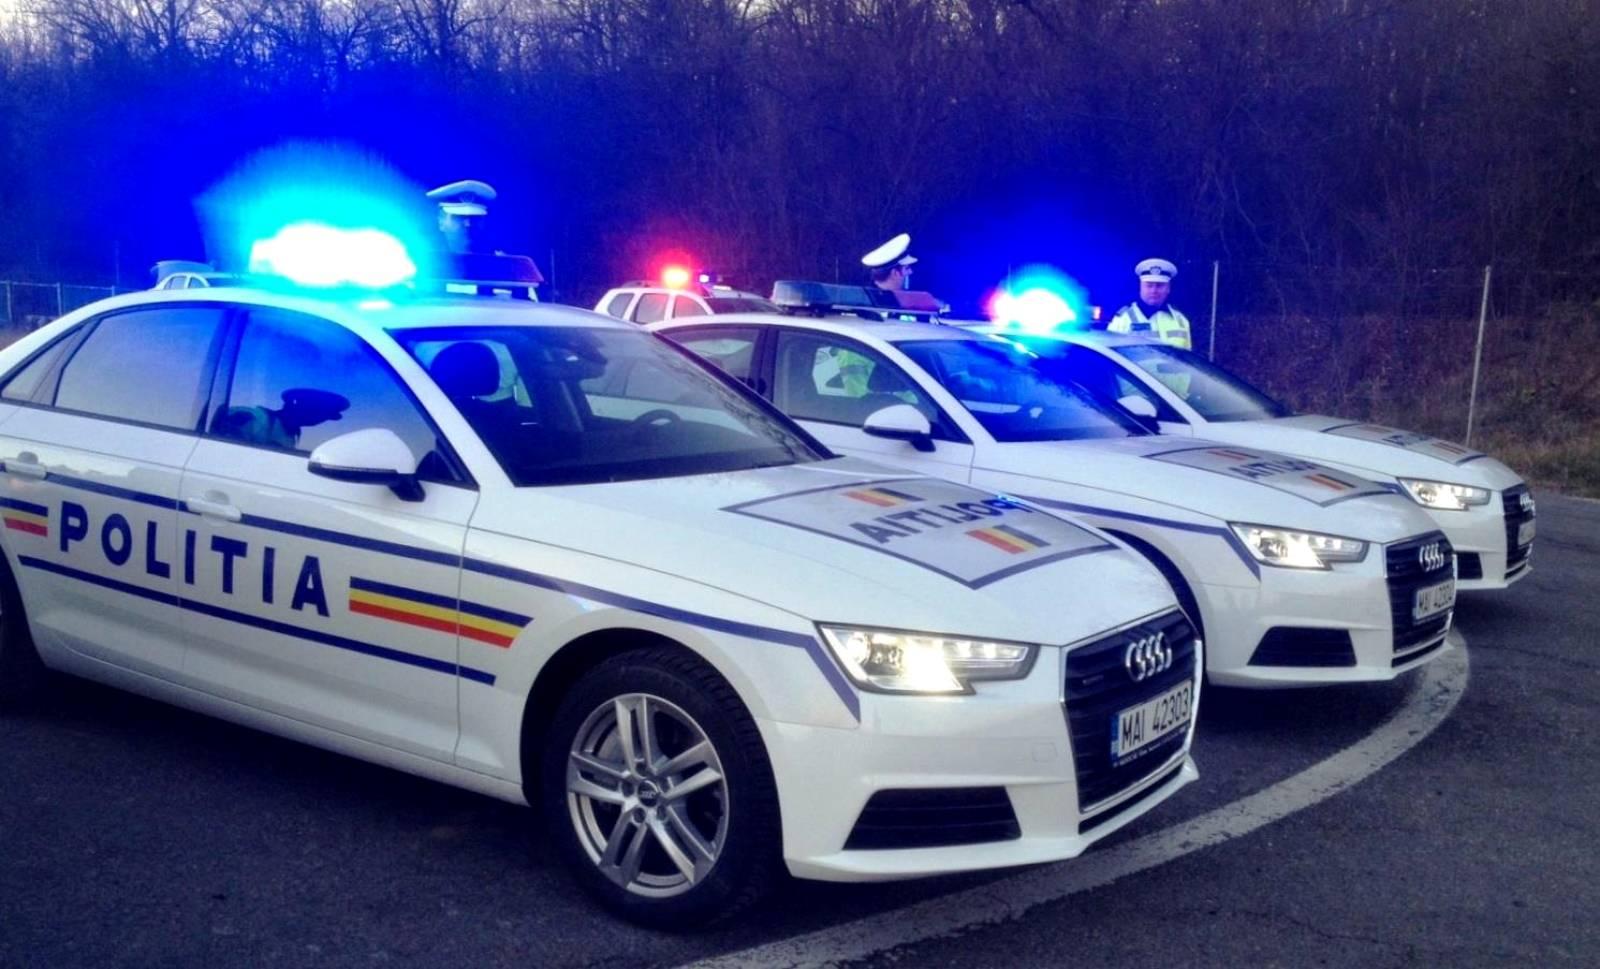 Politia Romana avertizare tragica